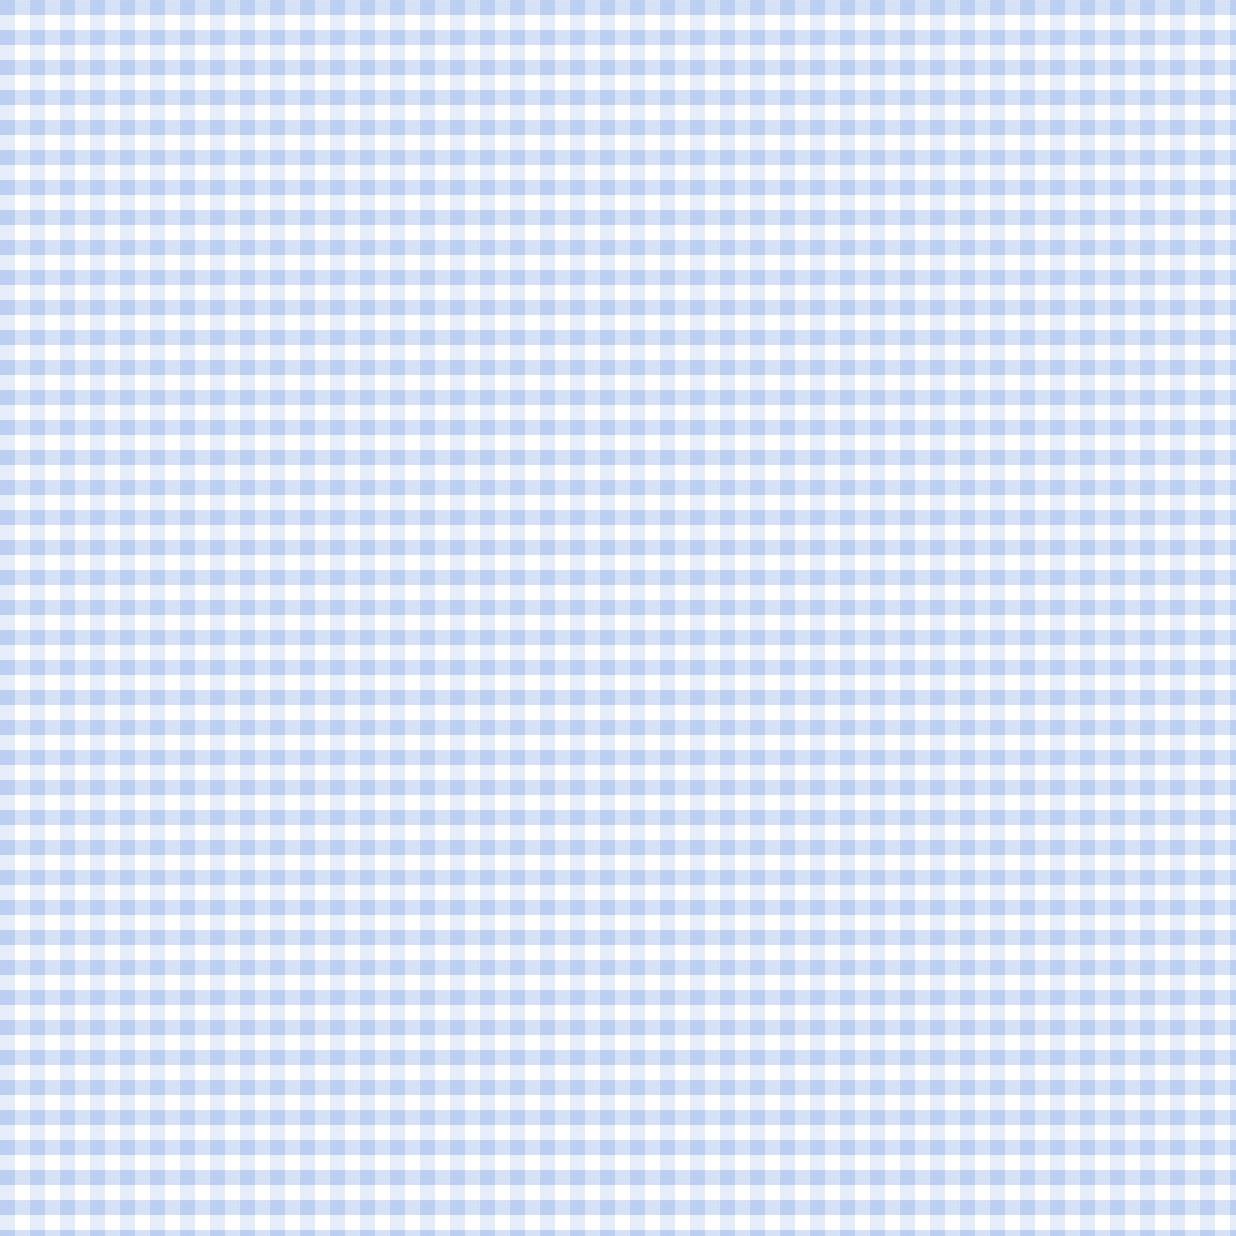 coton vichy bleu clair 5 mm tissus au m tre tissu coton. Black Bedroom Furniture Sets. Home Design Ideas